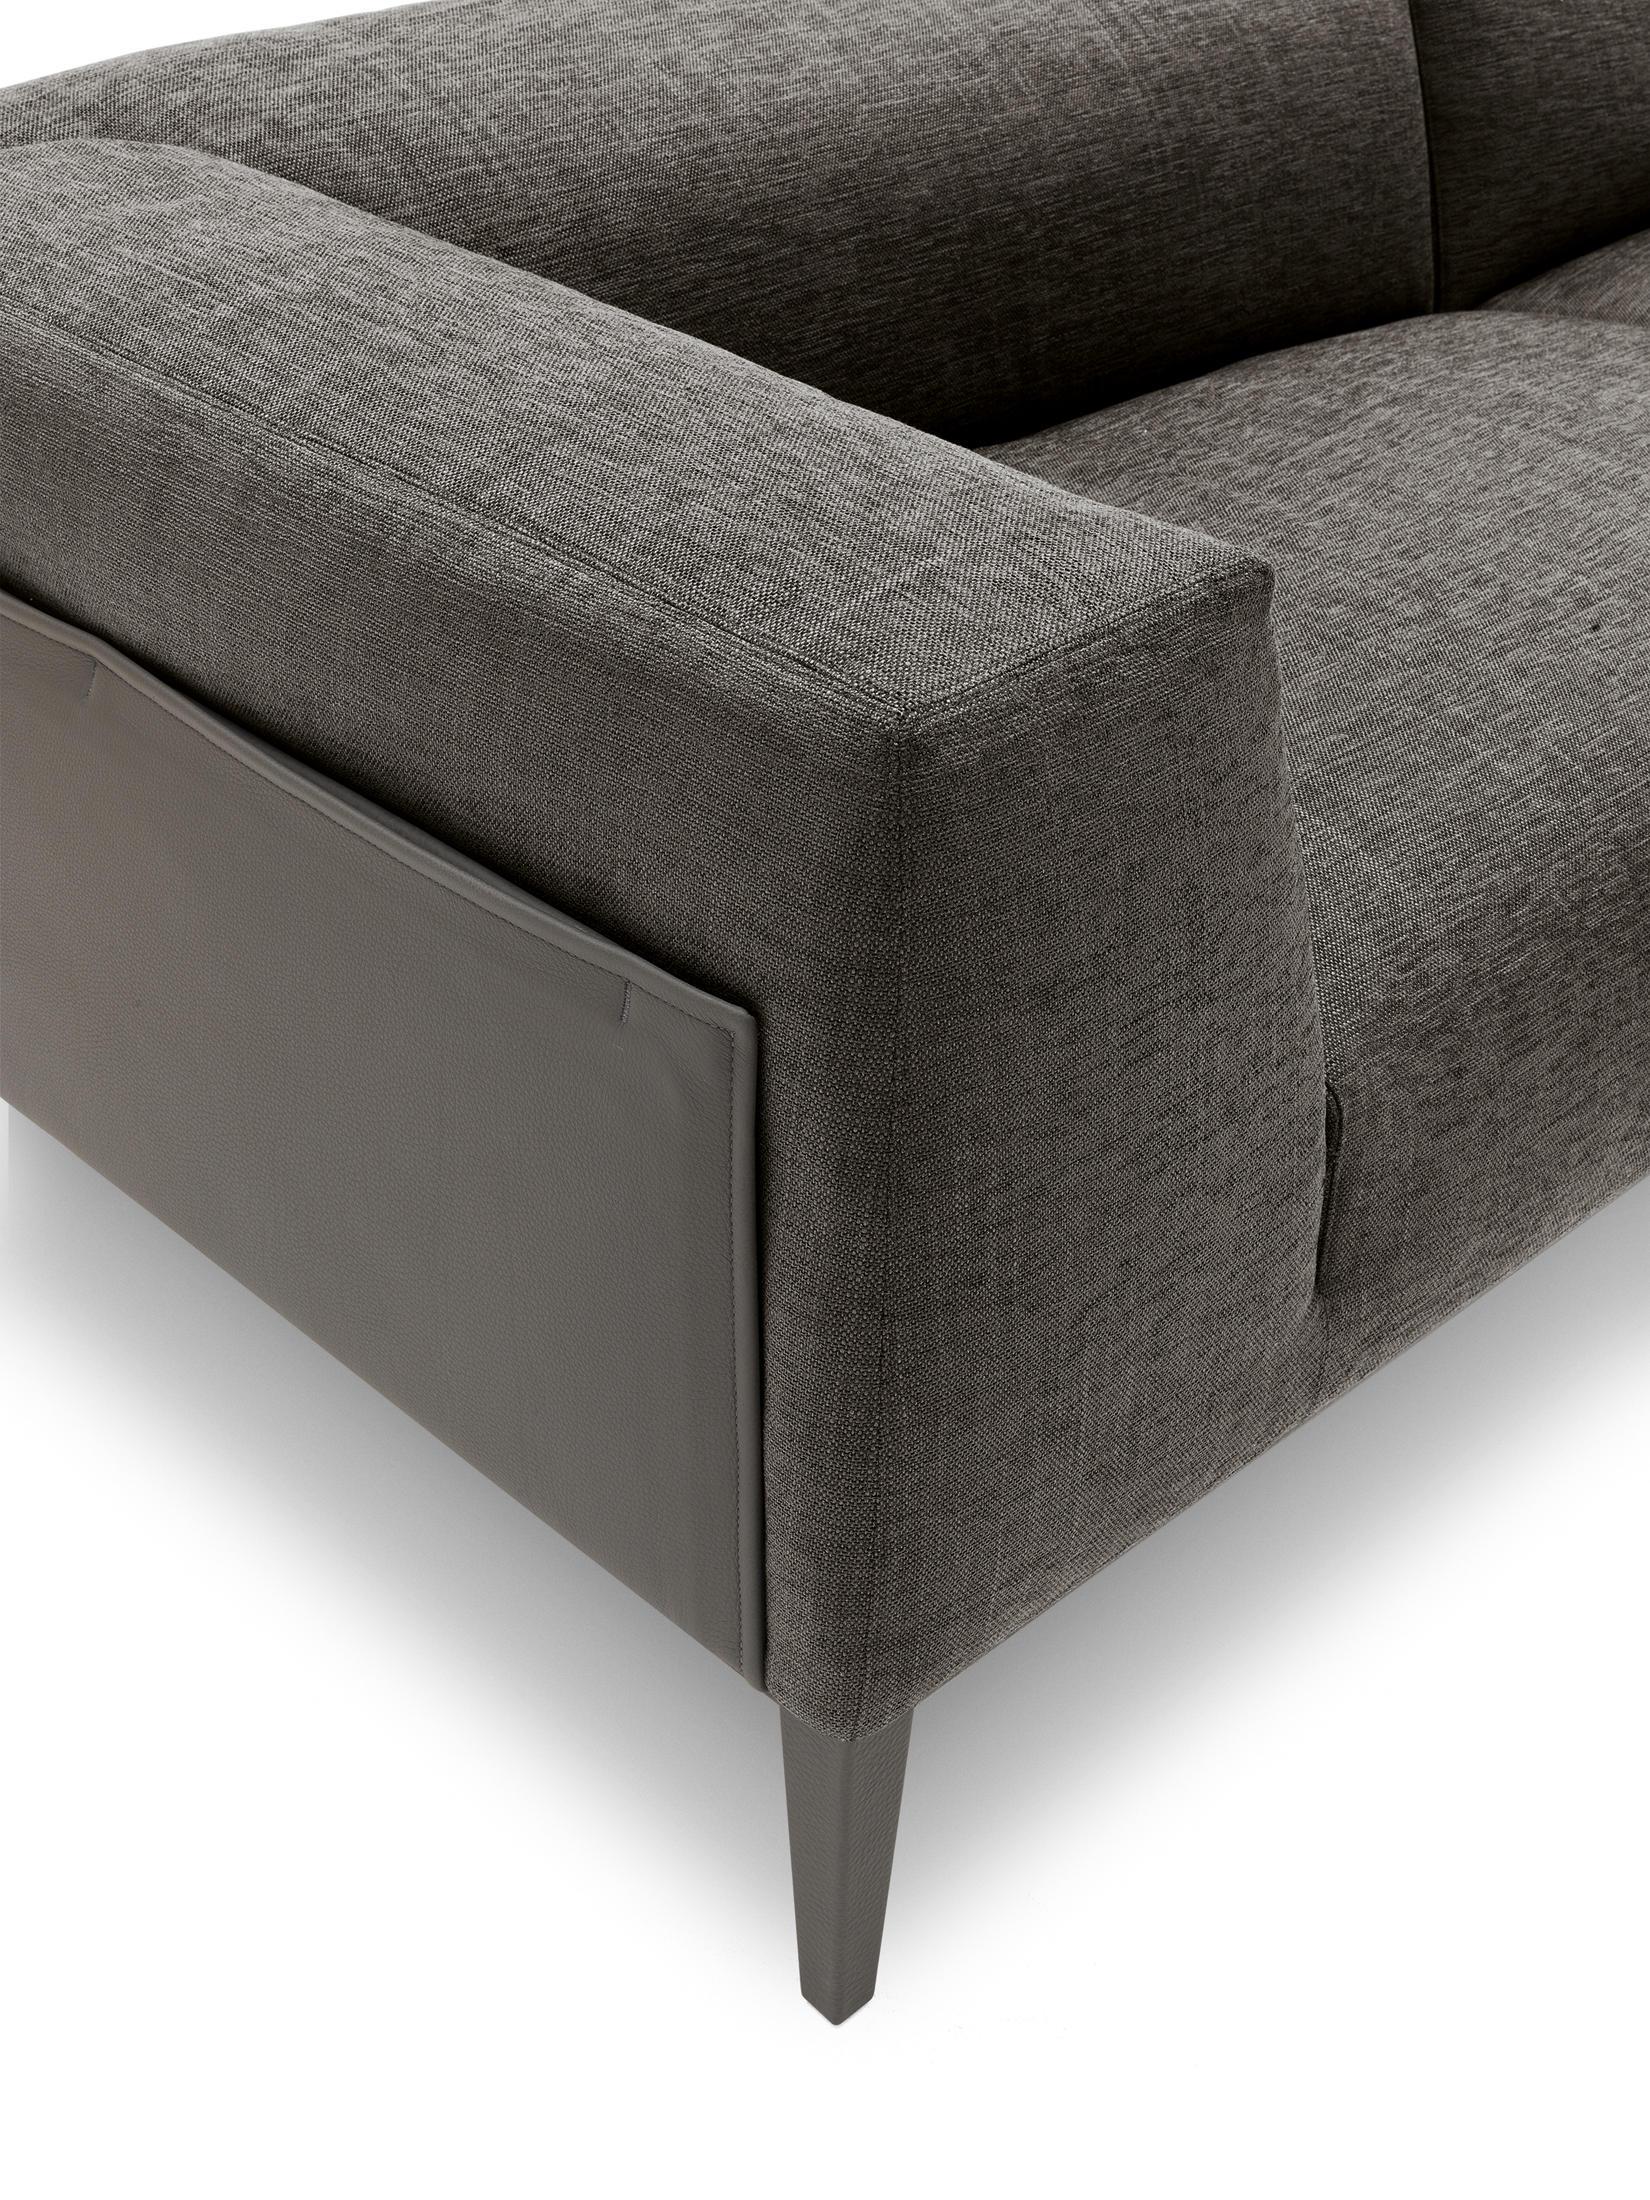 Metropolitan Sofa By Poliform Sofas